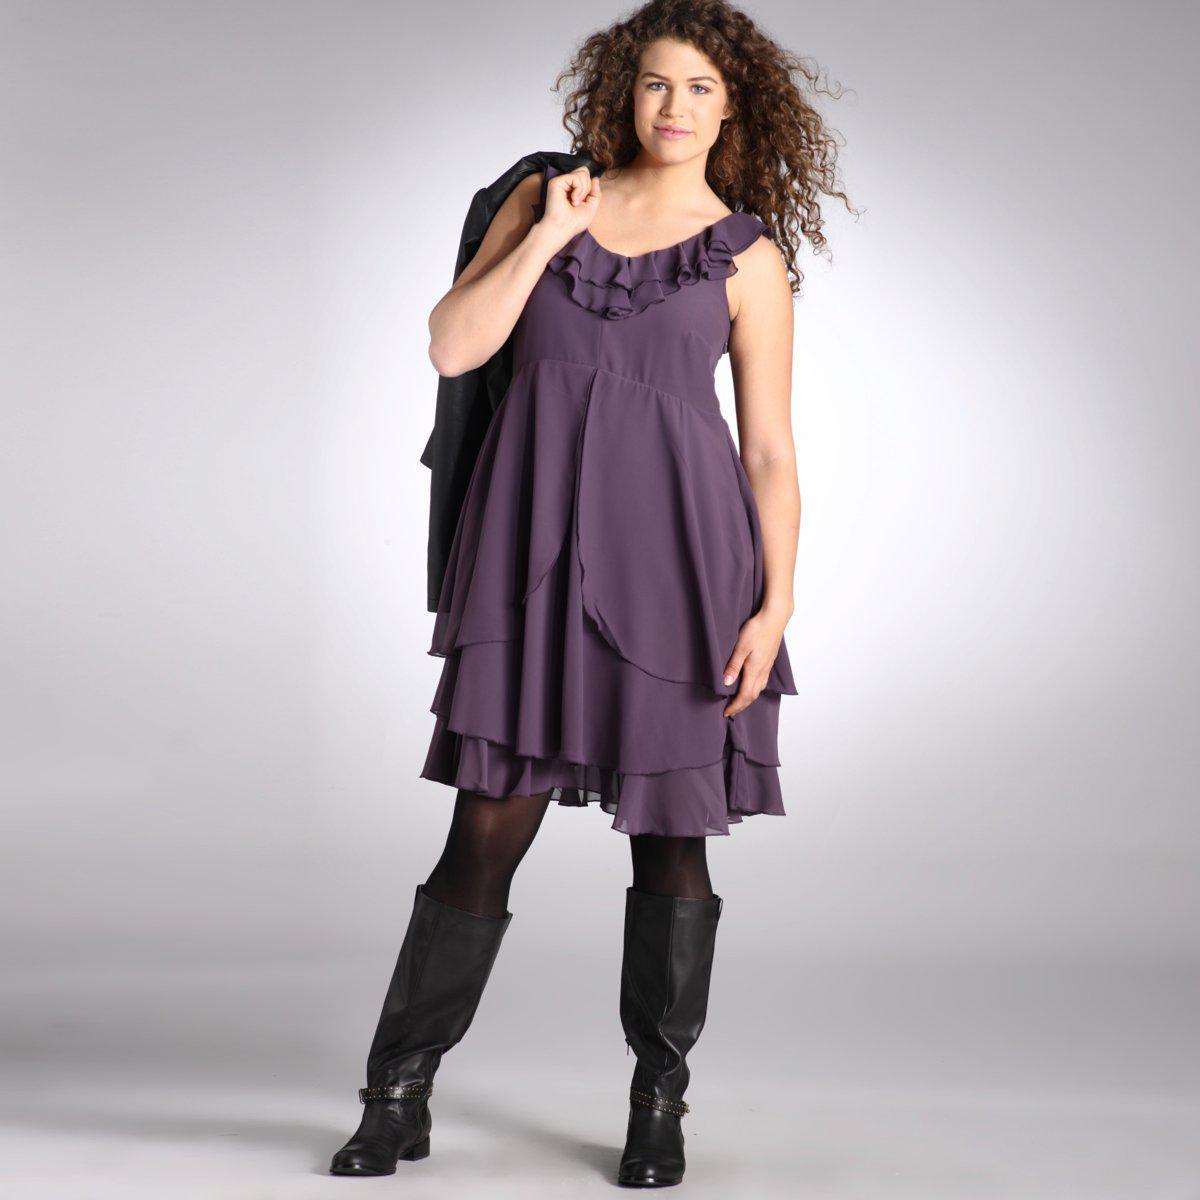 bradyna foremata 220 - Βραδυνα Φορεματα Plus Size Φθινόπωρο 2011 κωδ. 324205352